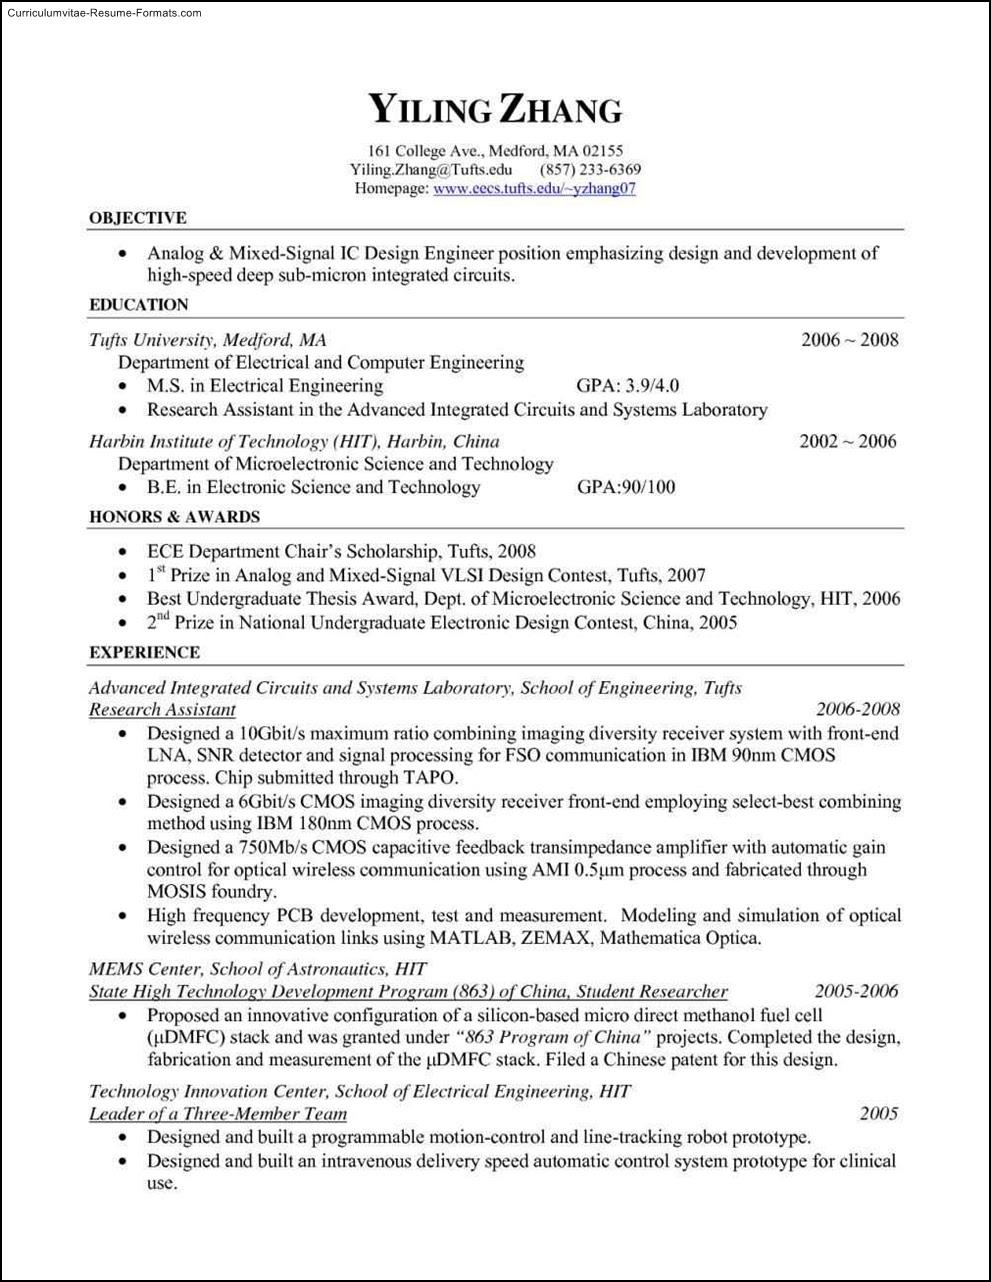 Free Resume Templates Pdf  Free Samples , Examples  Format Resume \/ Curruculum Vitae  Free